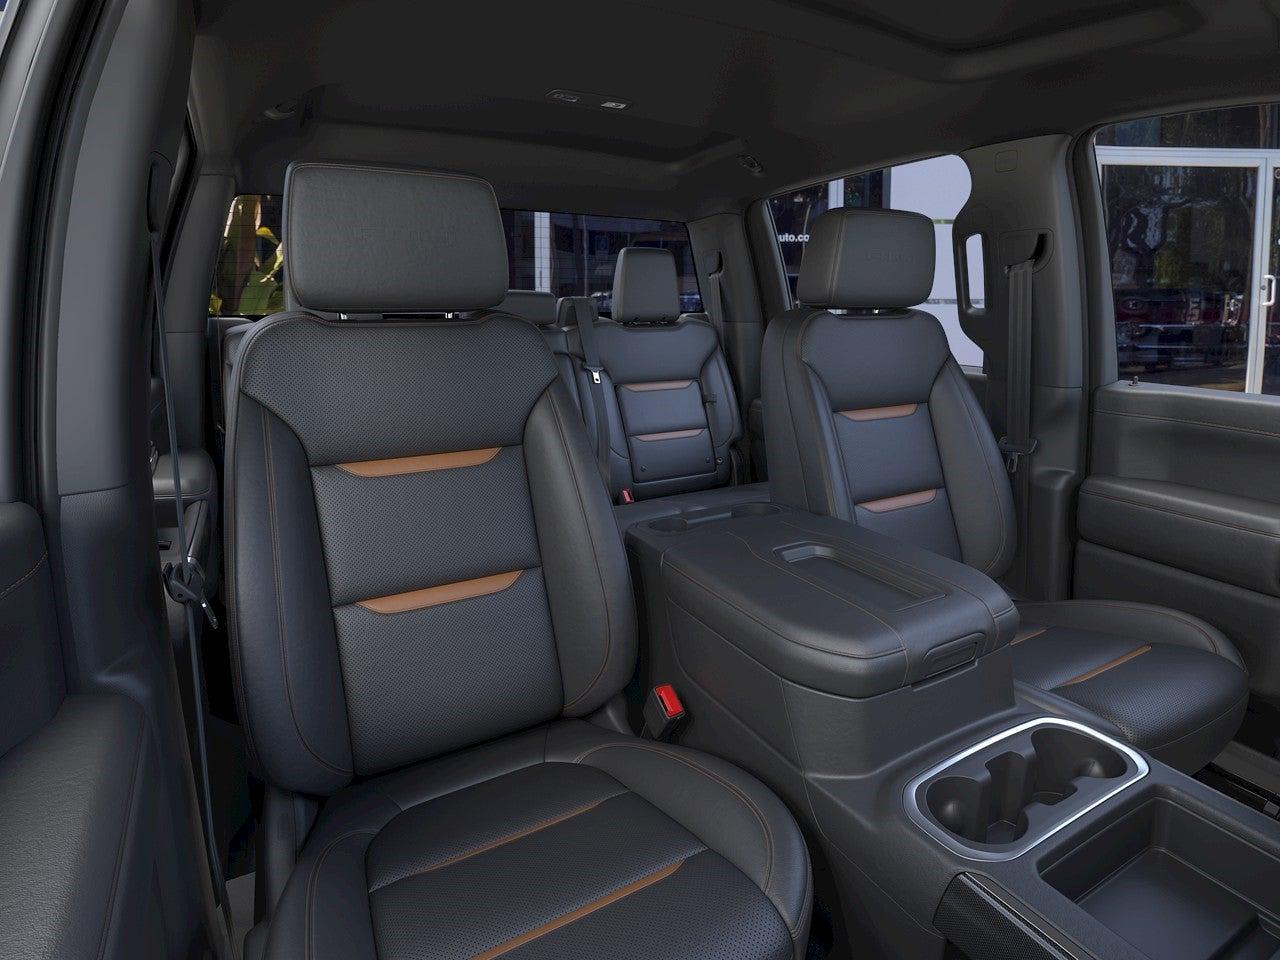 2021 GMC Sierra 2500 Crew Cab 4x4, Pickup #T21435 - photo 33